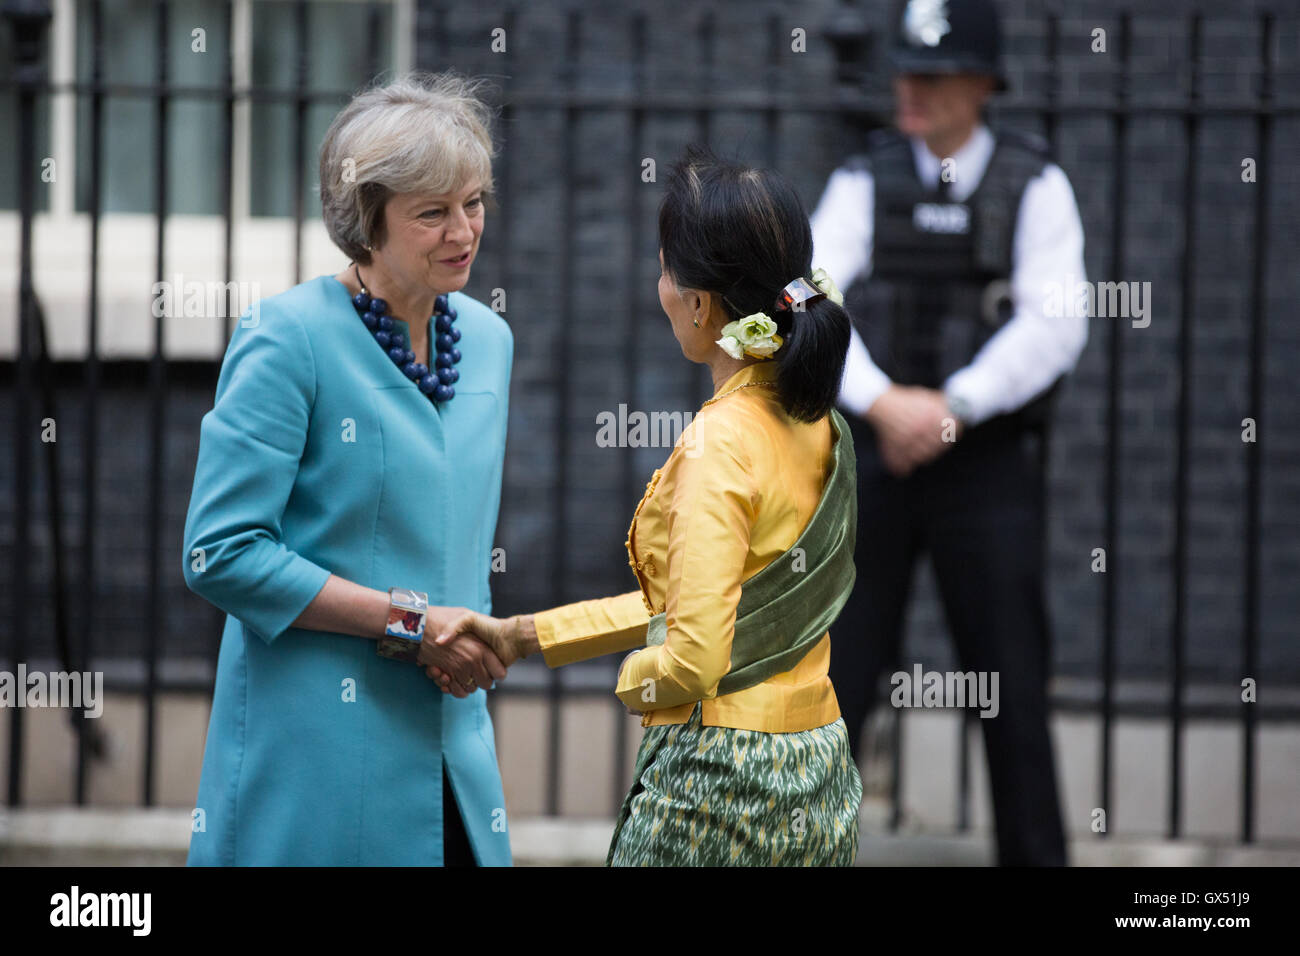 londres royaume uni premier ministre theresa mai rencontre aung san suu kyi prix nobel et. Black Bedroom Furniture Sets. Home Design Ideas